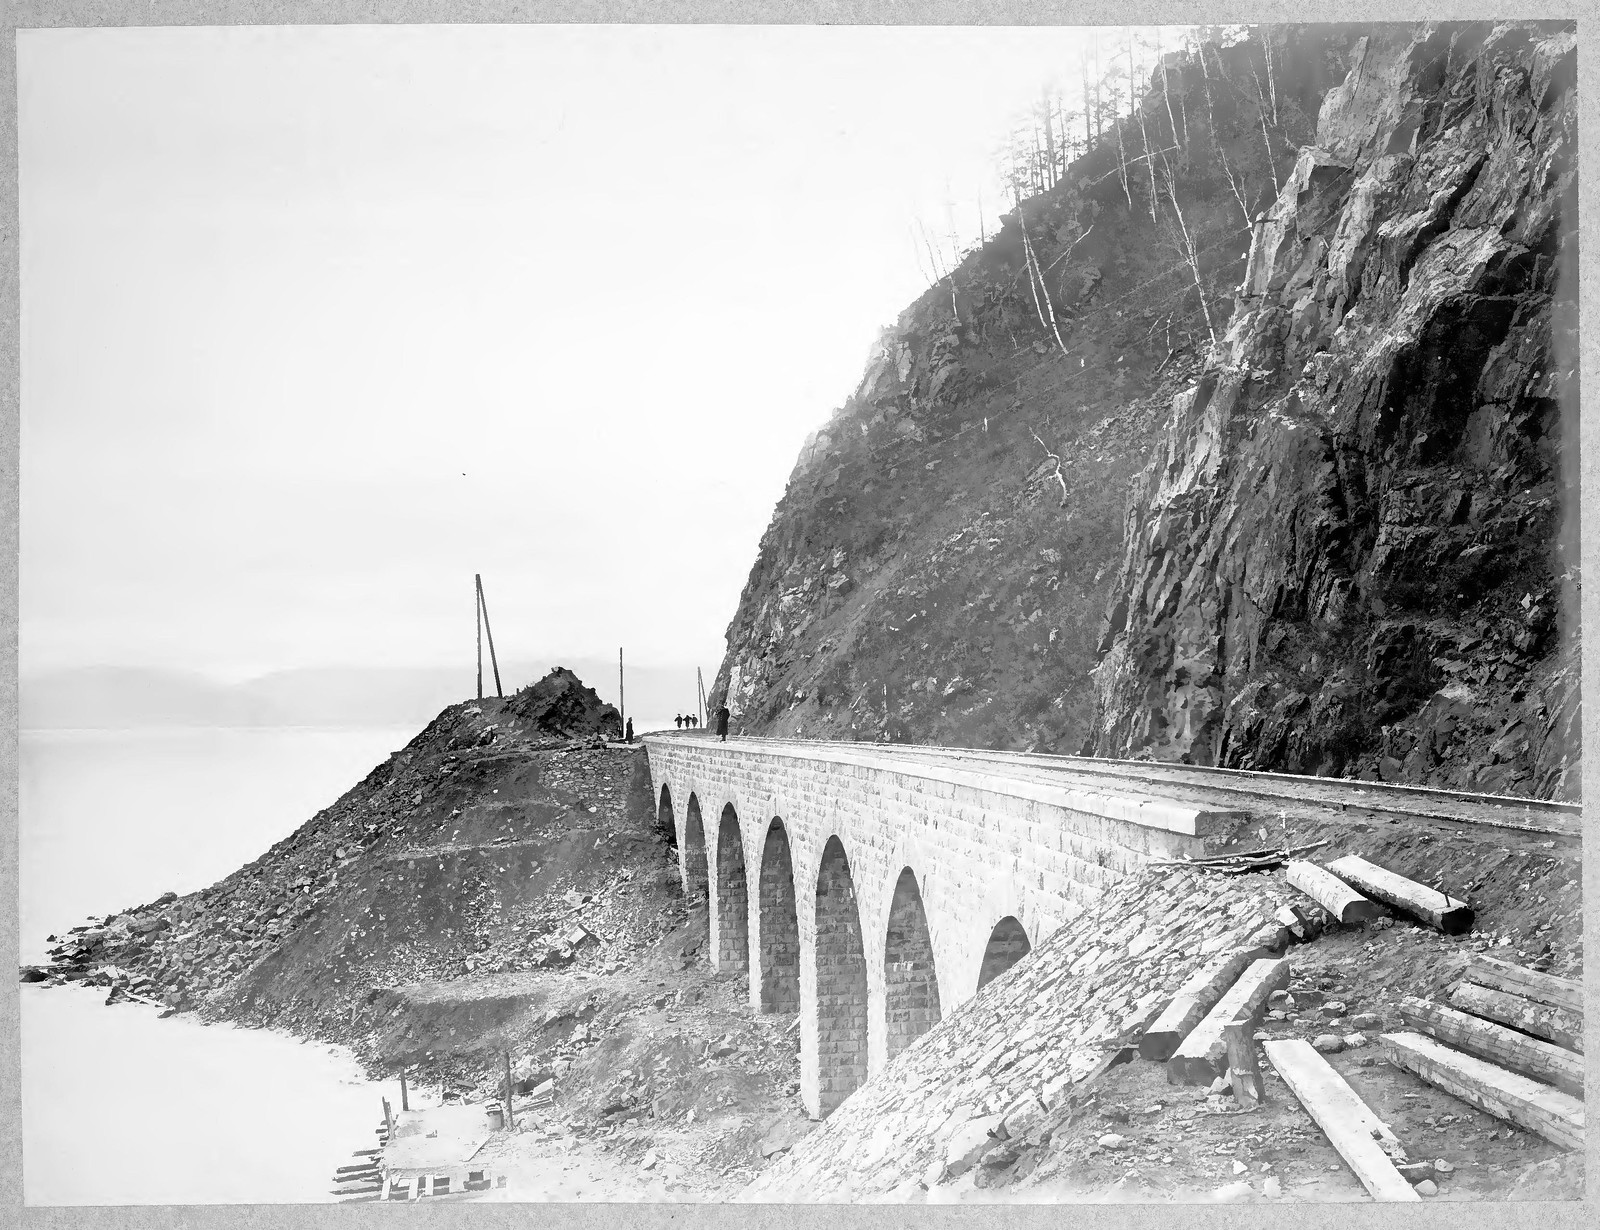 40. Виадук длиной 40,2 сажени на 72 версте.